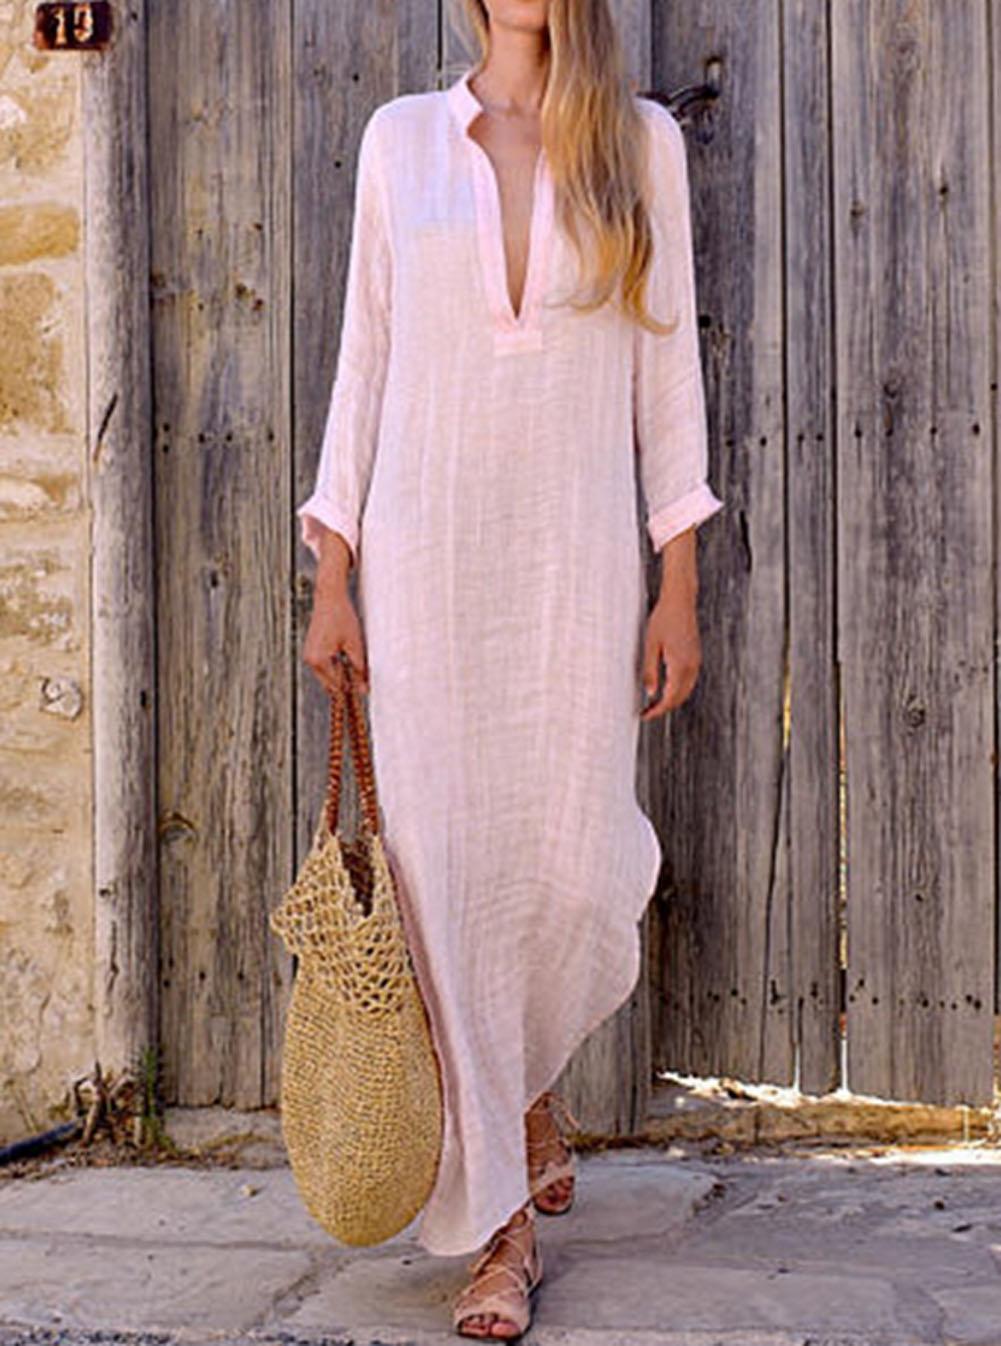 Women Gypsy Dresses Robe Long Sleeve V-neck Ethnic Boho Cotton Linen Summer Beach Maxi Dress 5